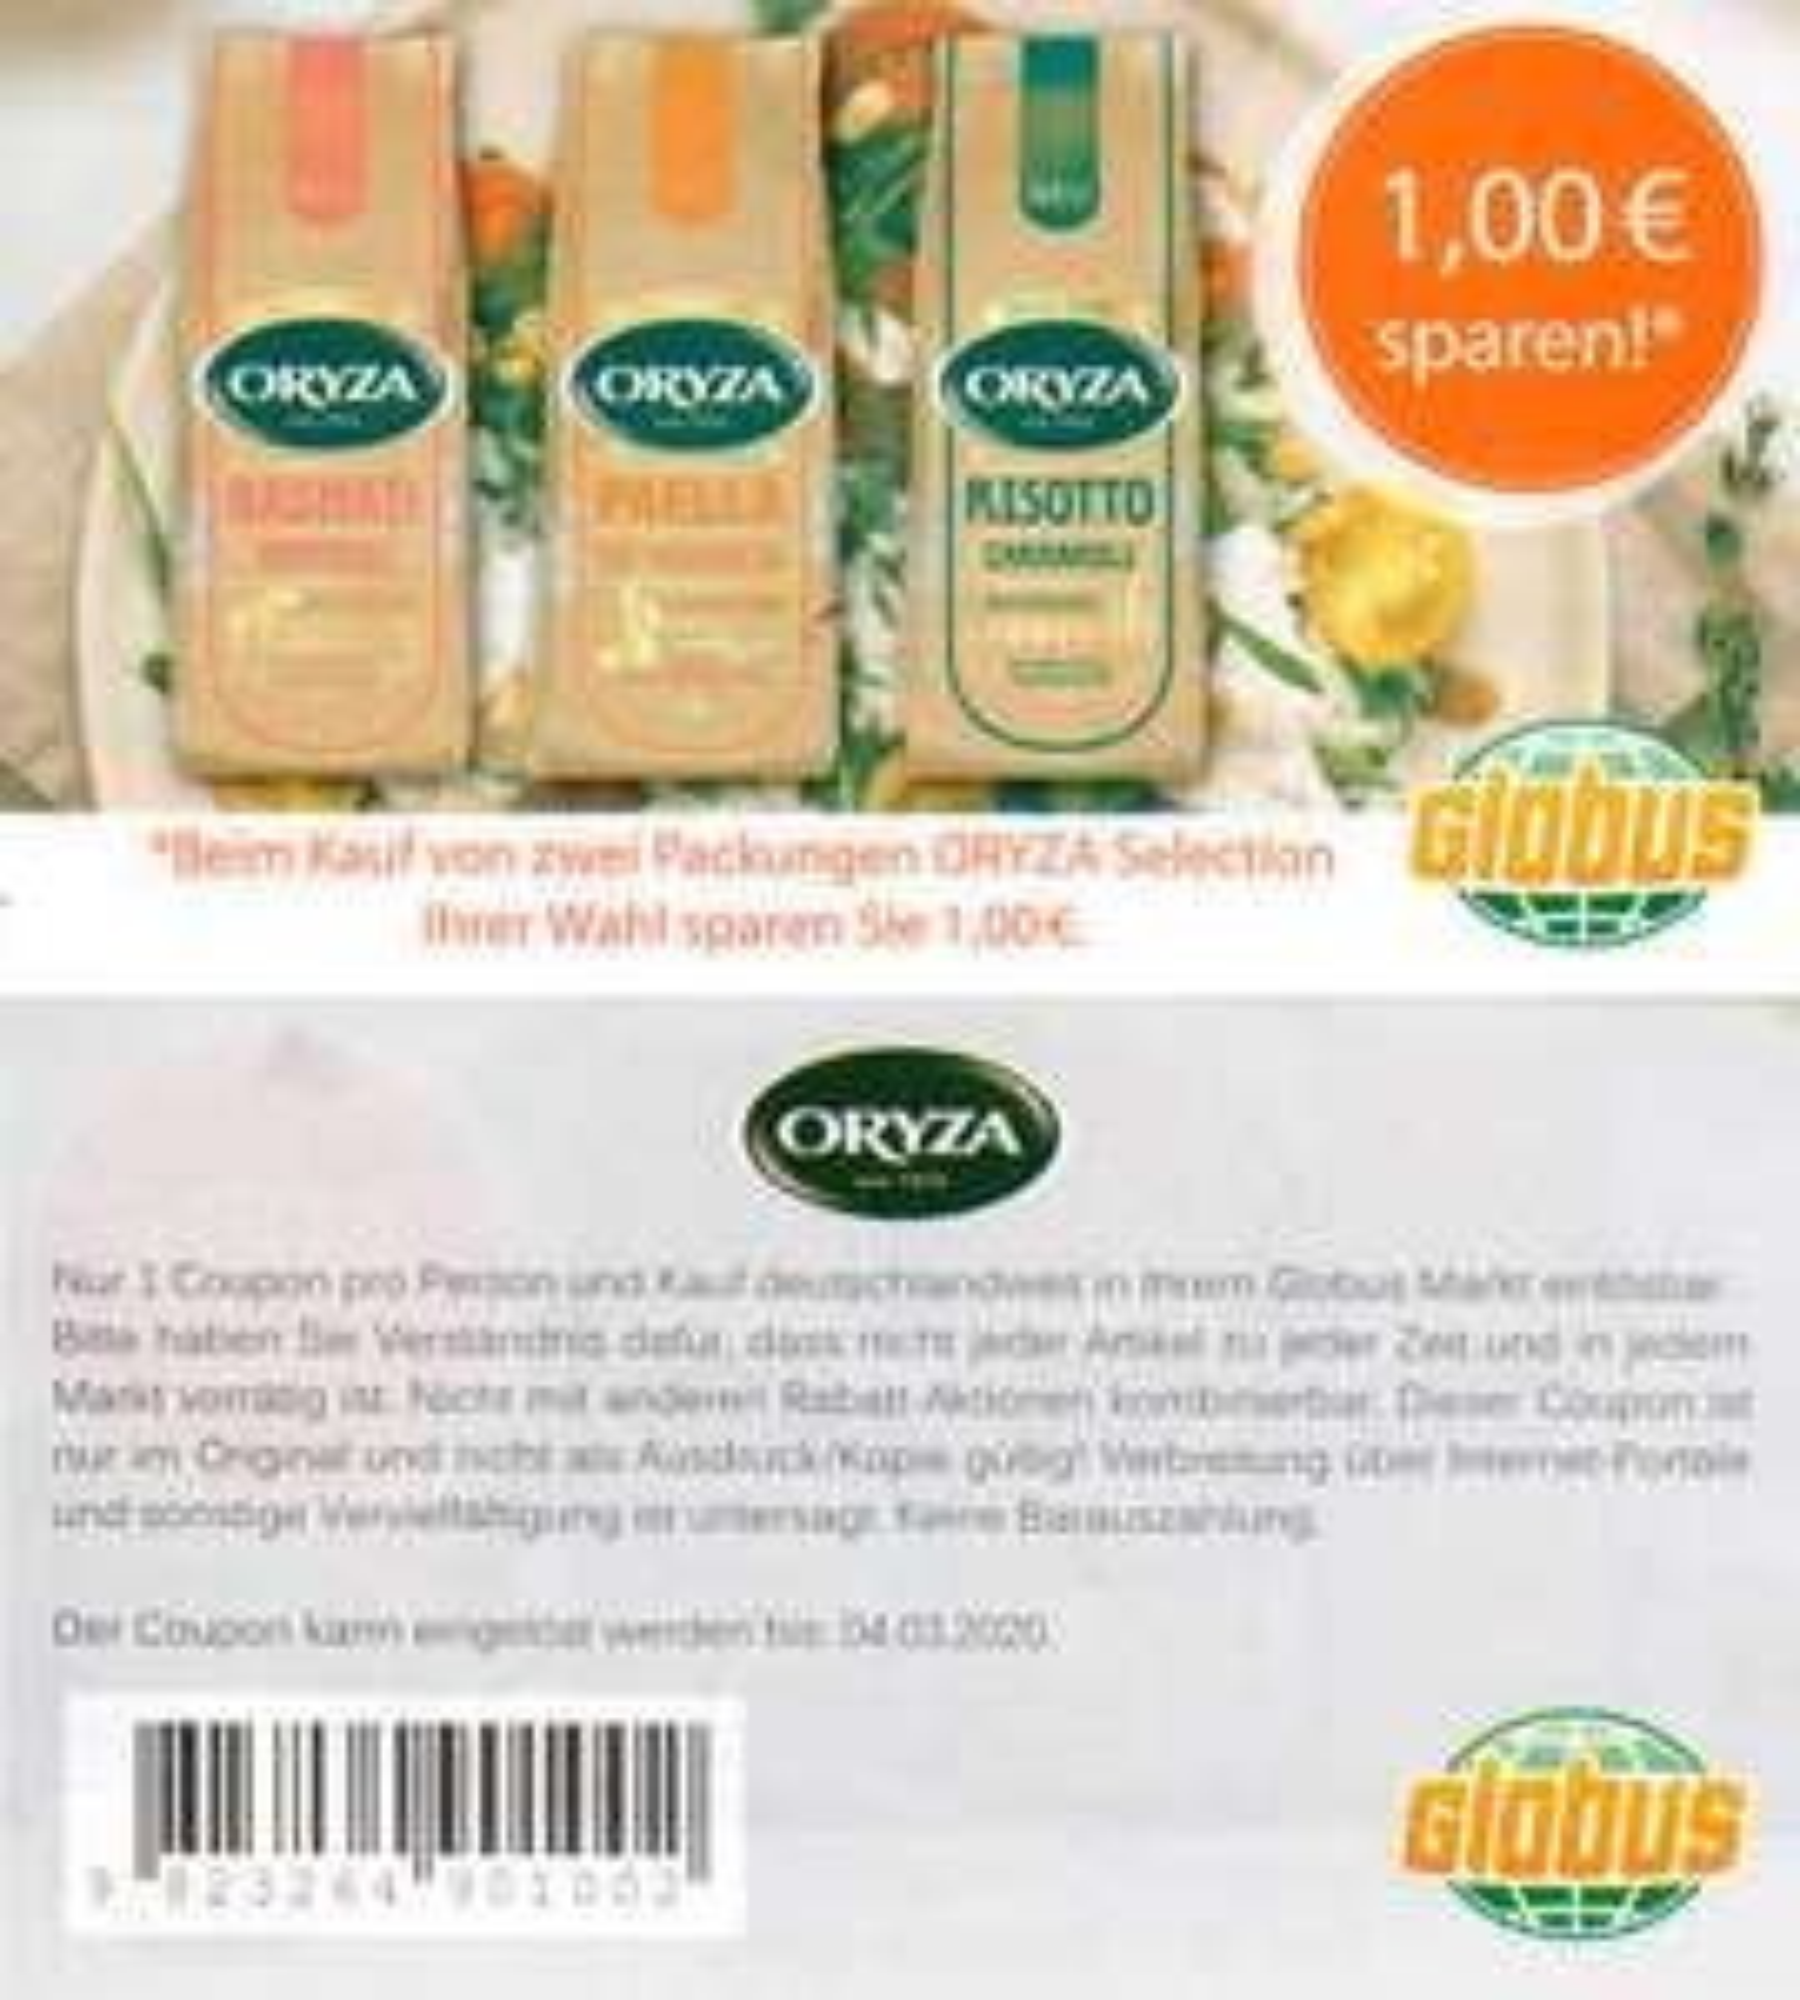 [GLOBUS] 1€ Coupon für 2x Oryza Selection bis 04.03.2020